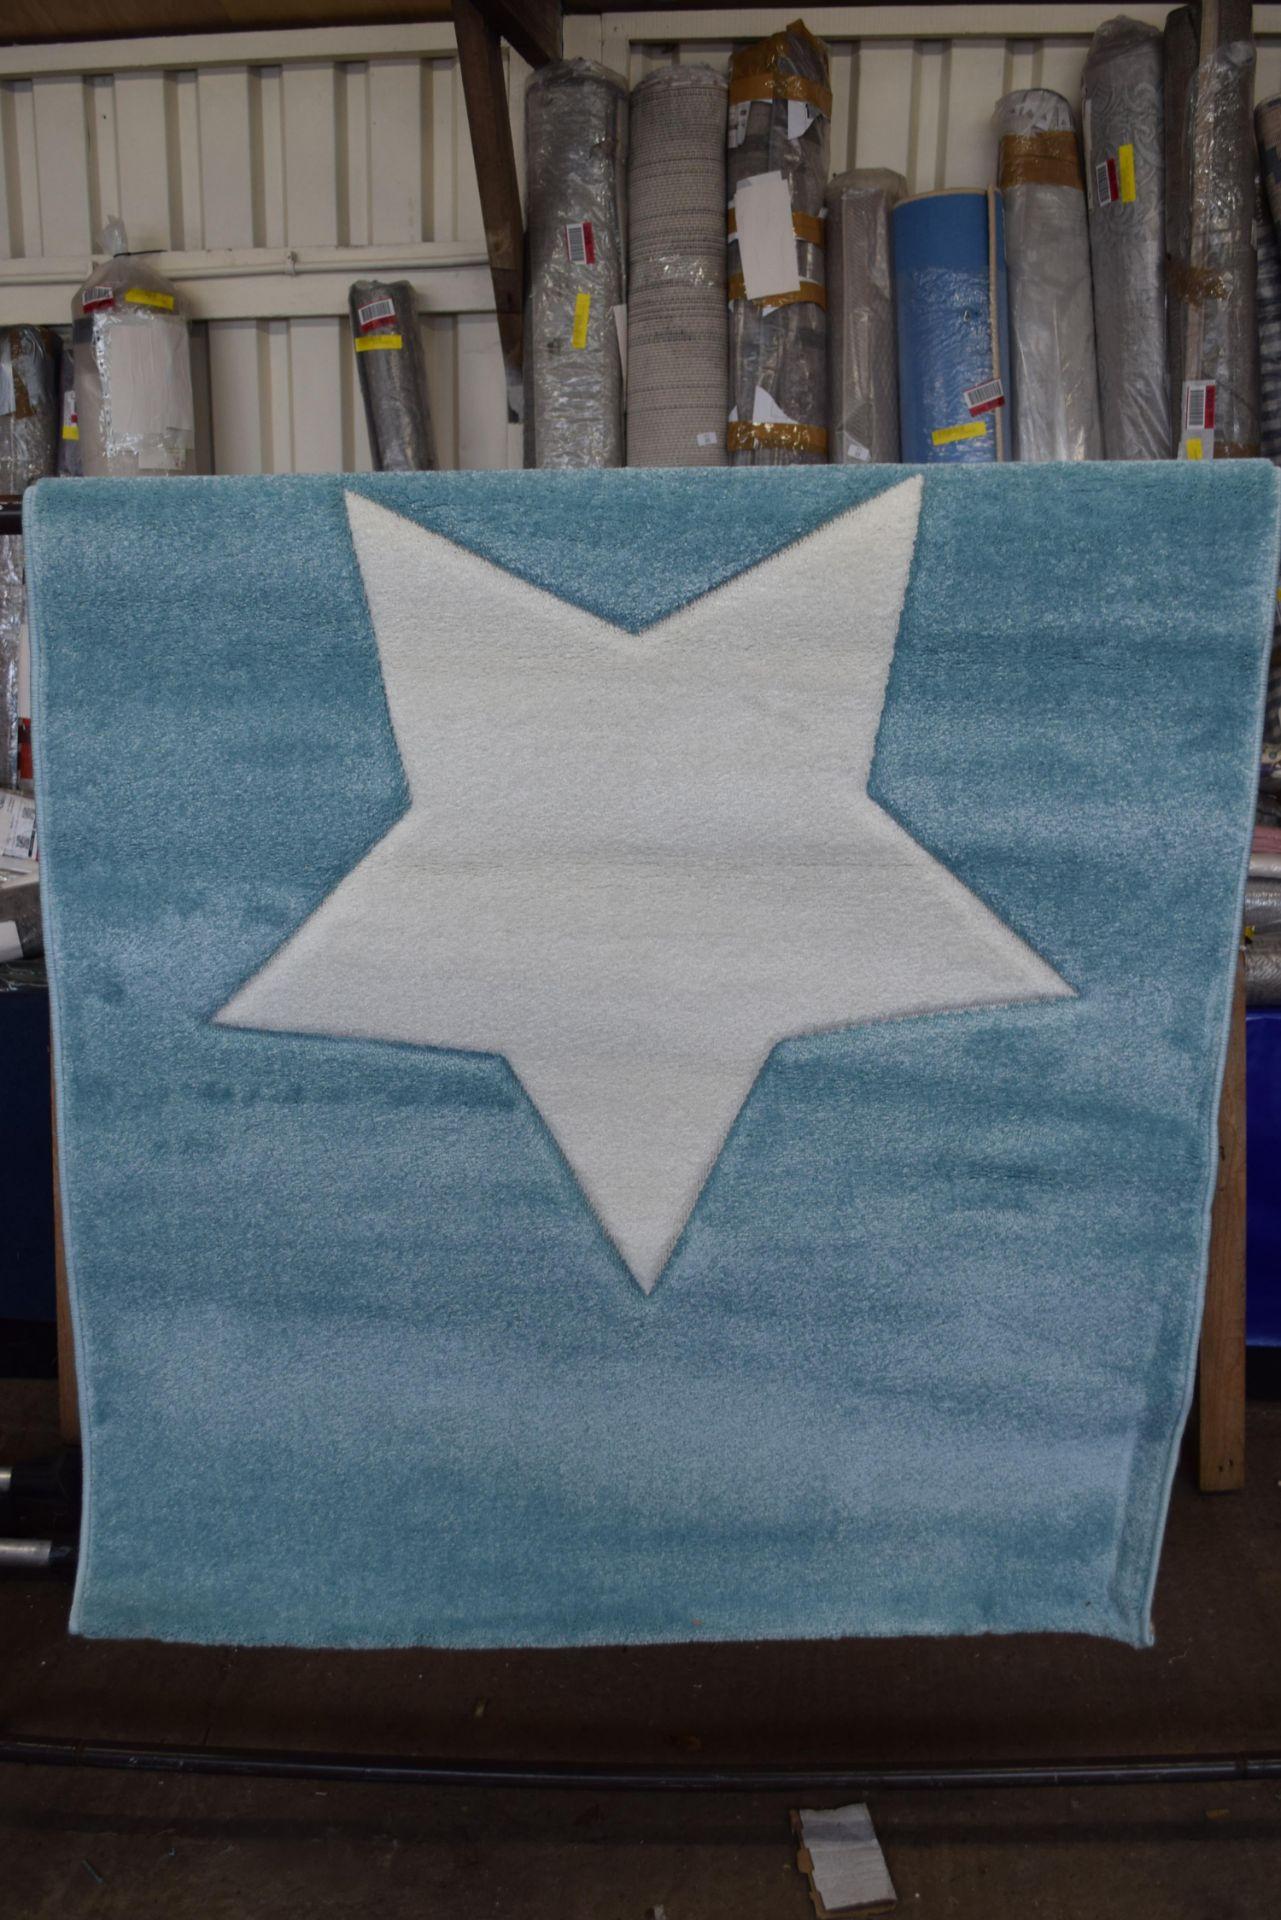 Isabel & Max Benjamin blue rug, 120 x 170cm RRP £65.99 - Image 2 of 3